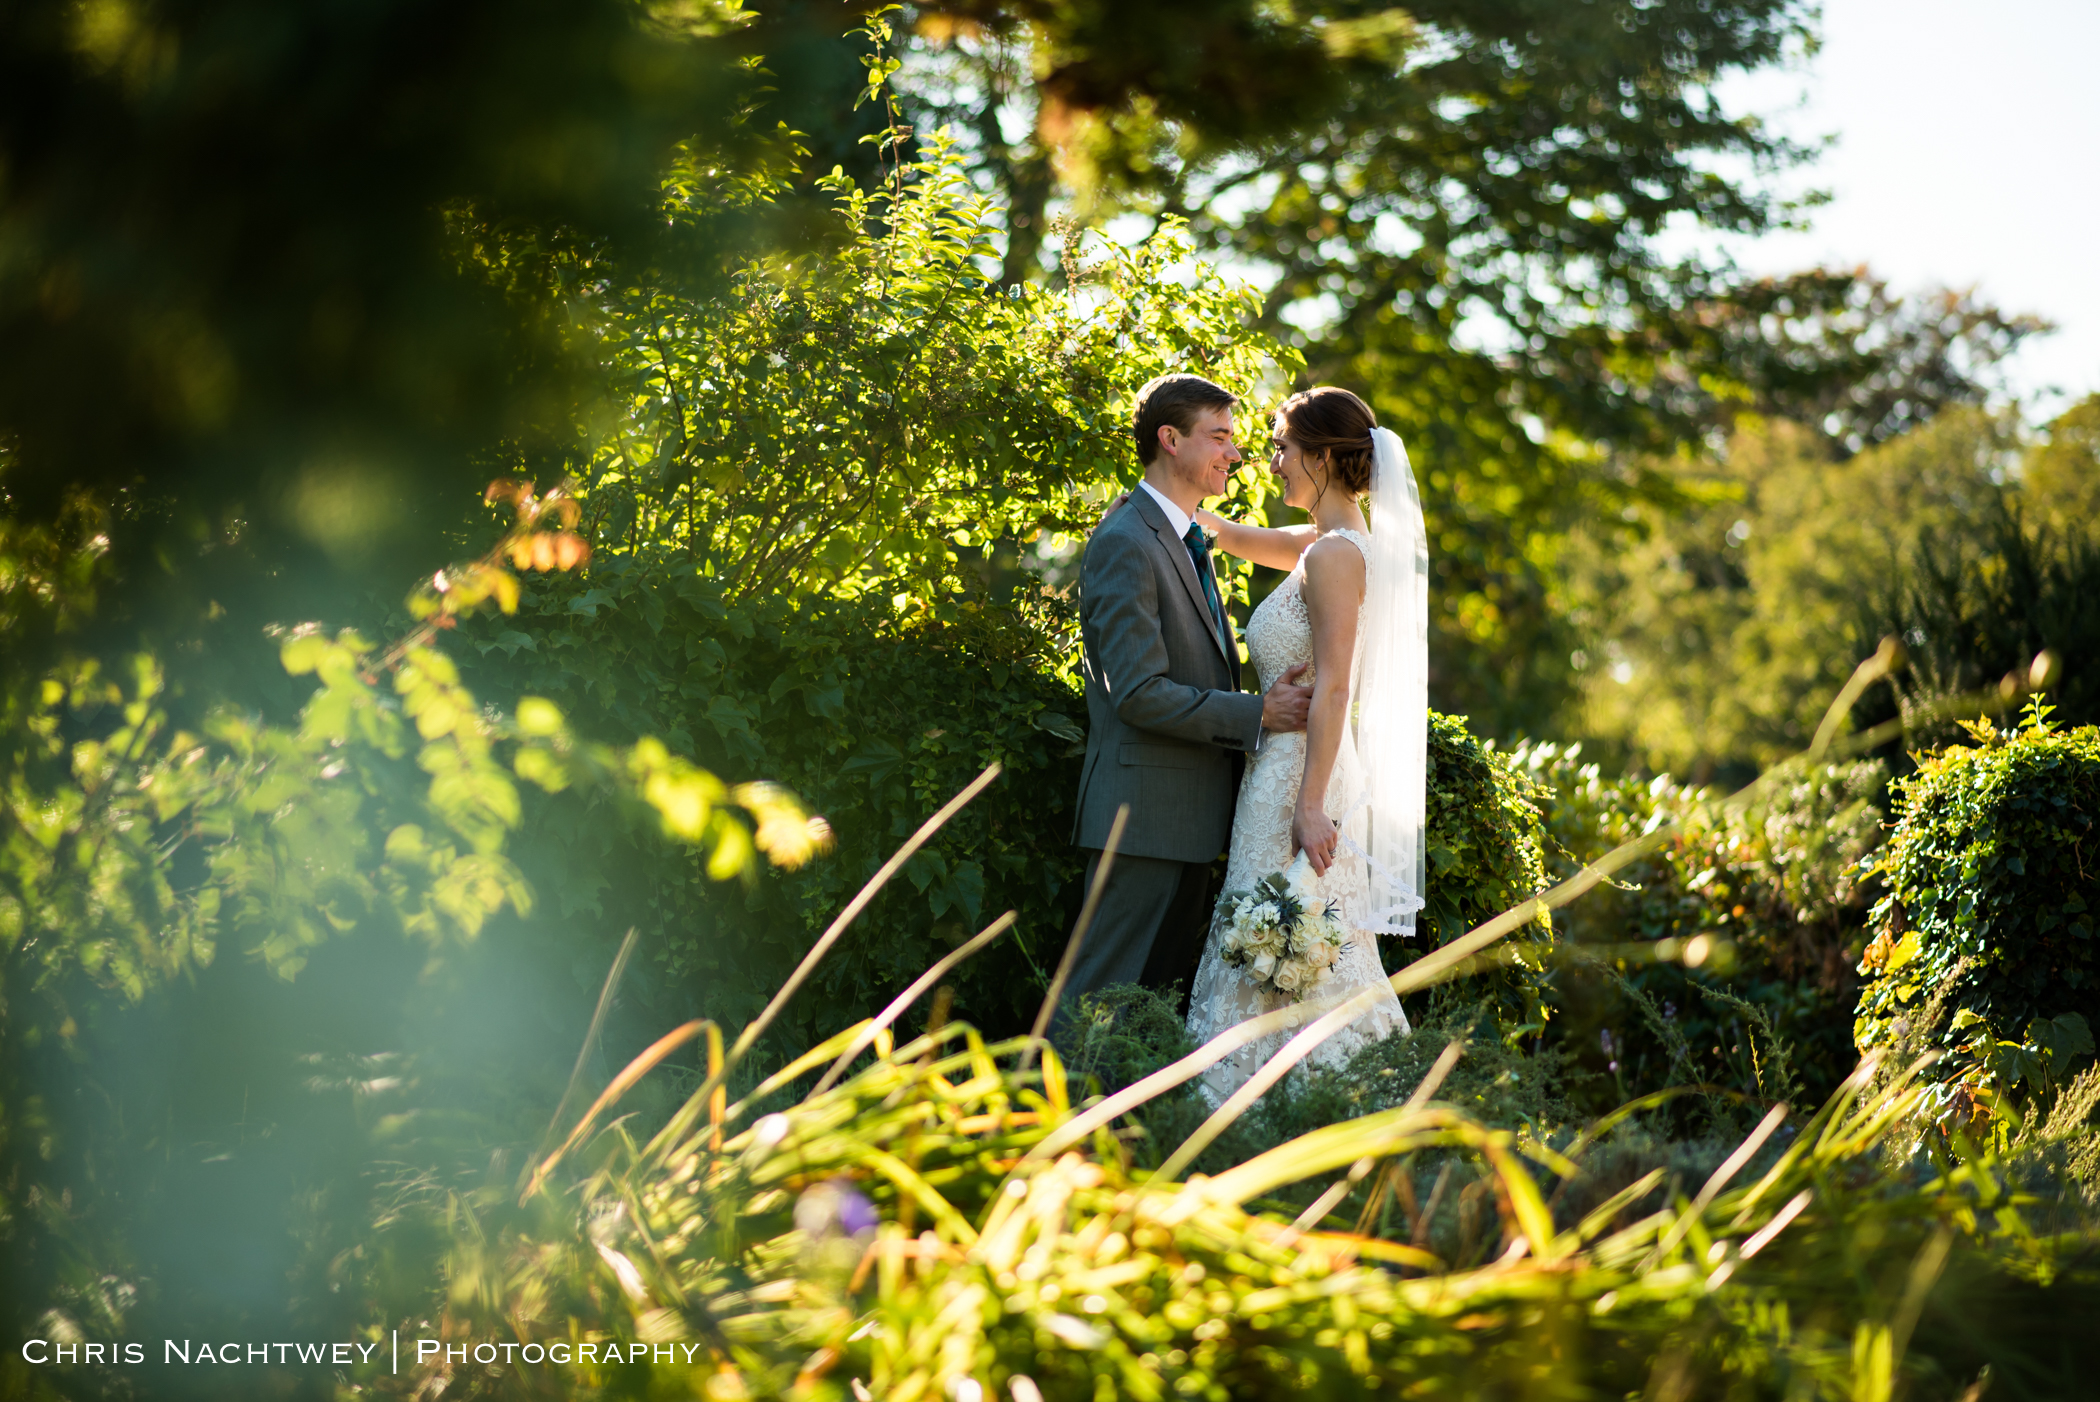 harkness-wedding-photos-chris-nachtwey-photography-2018-18.jpg